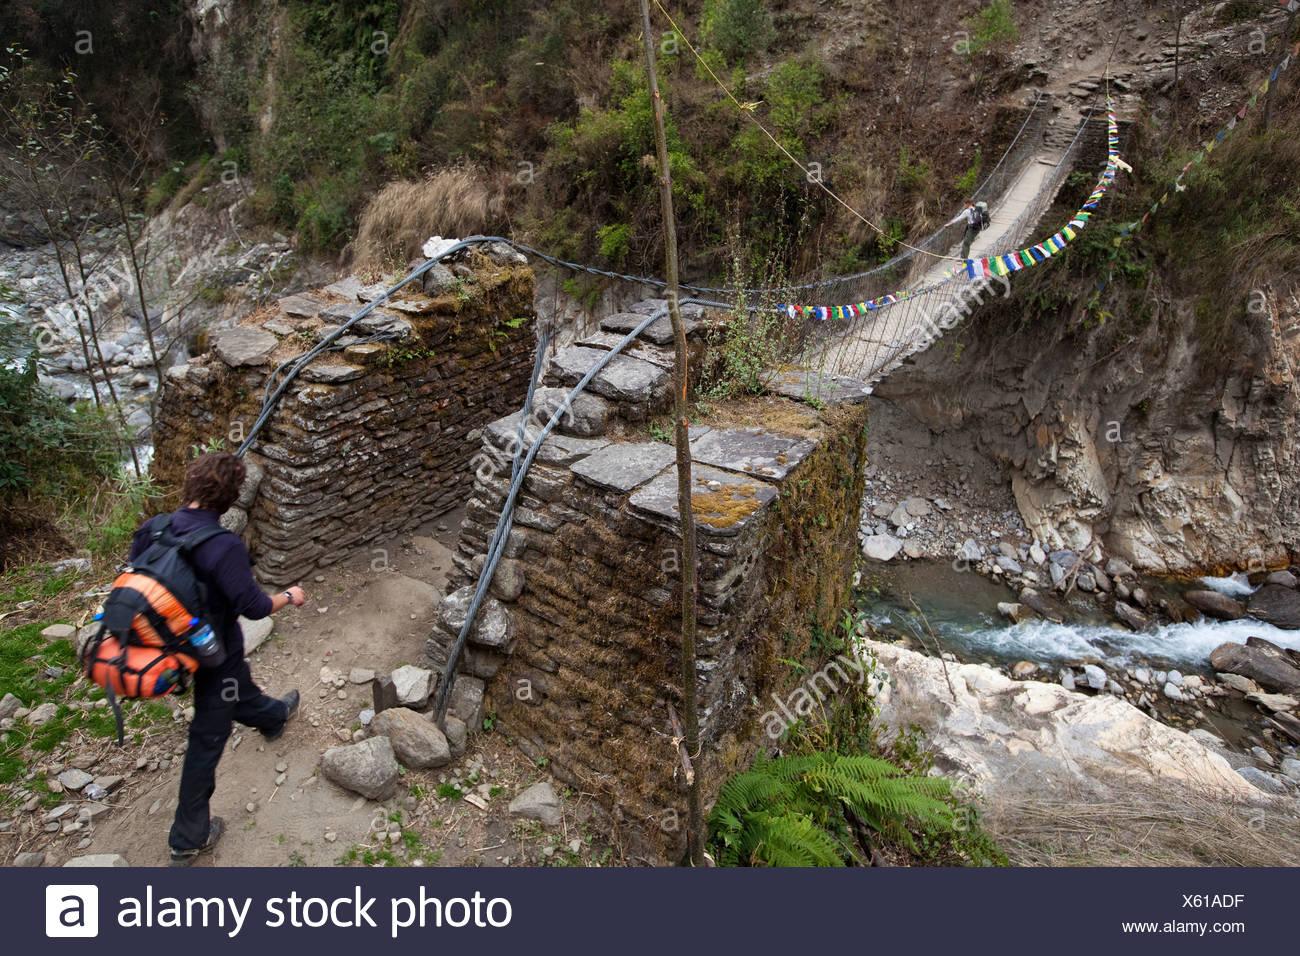 A male trekker approaches a footbridge while a female trekker pauses on the bridge ahead. - Stock Image